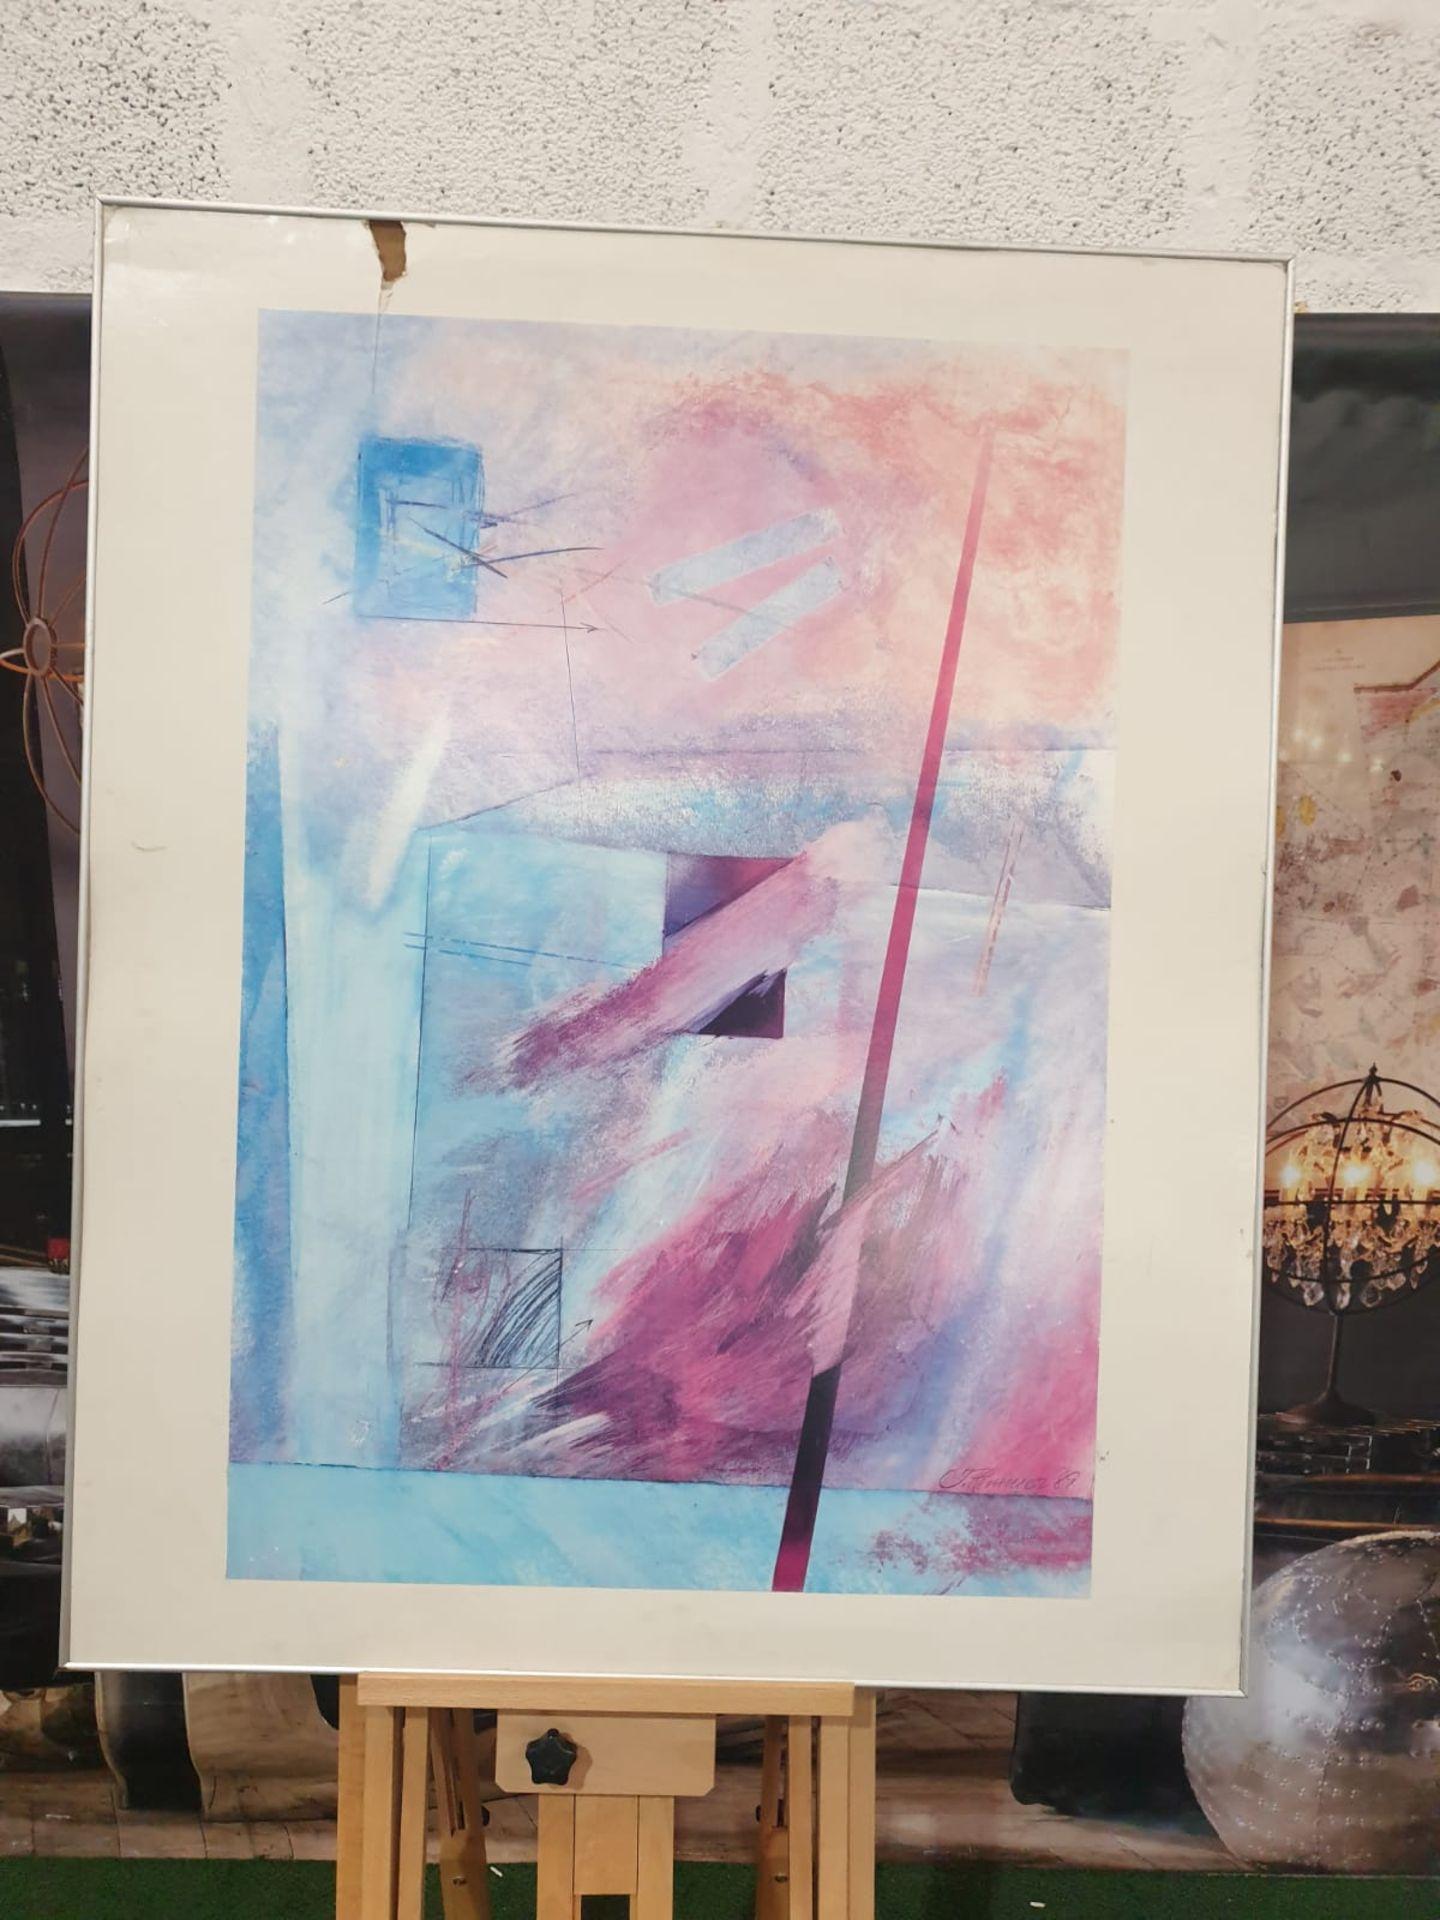 Abstract Blue/Purple wall art J. Hermasuez 89 91 x 111cm - Image 3 of 5